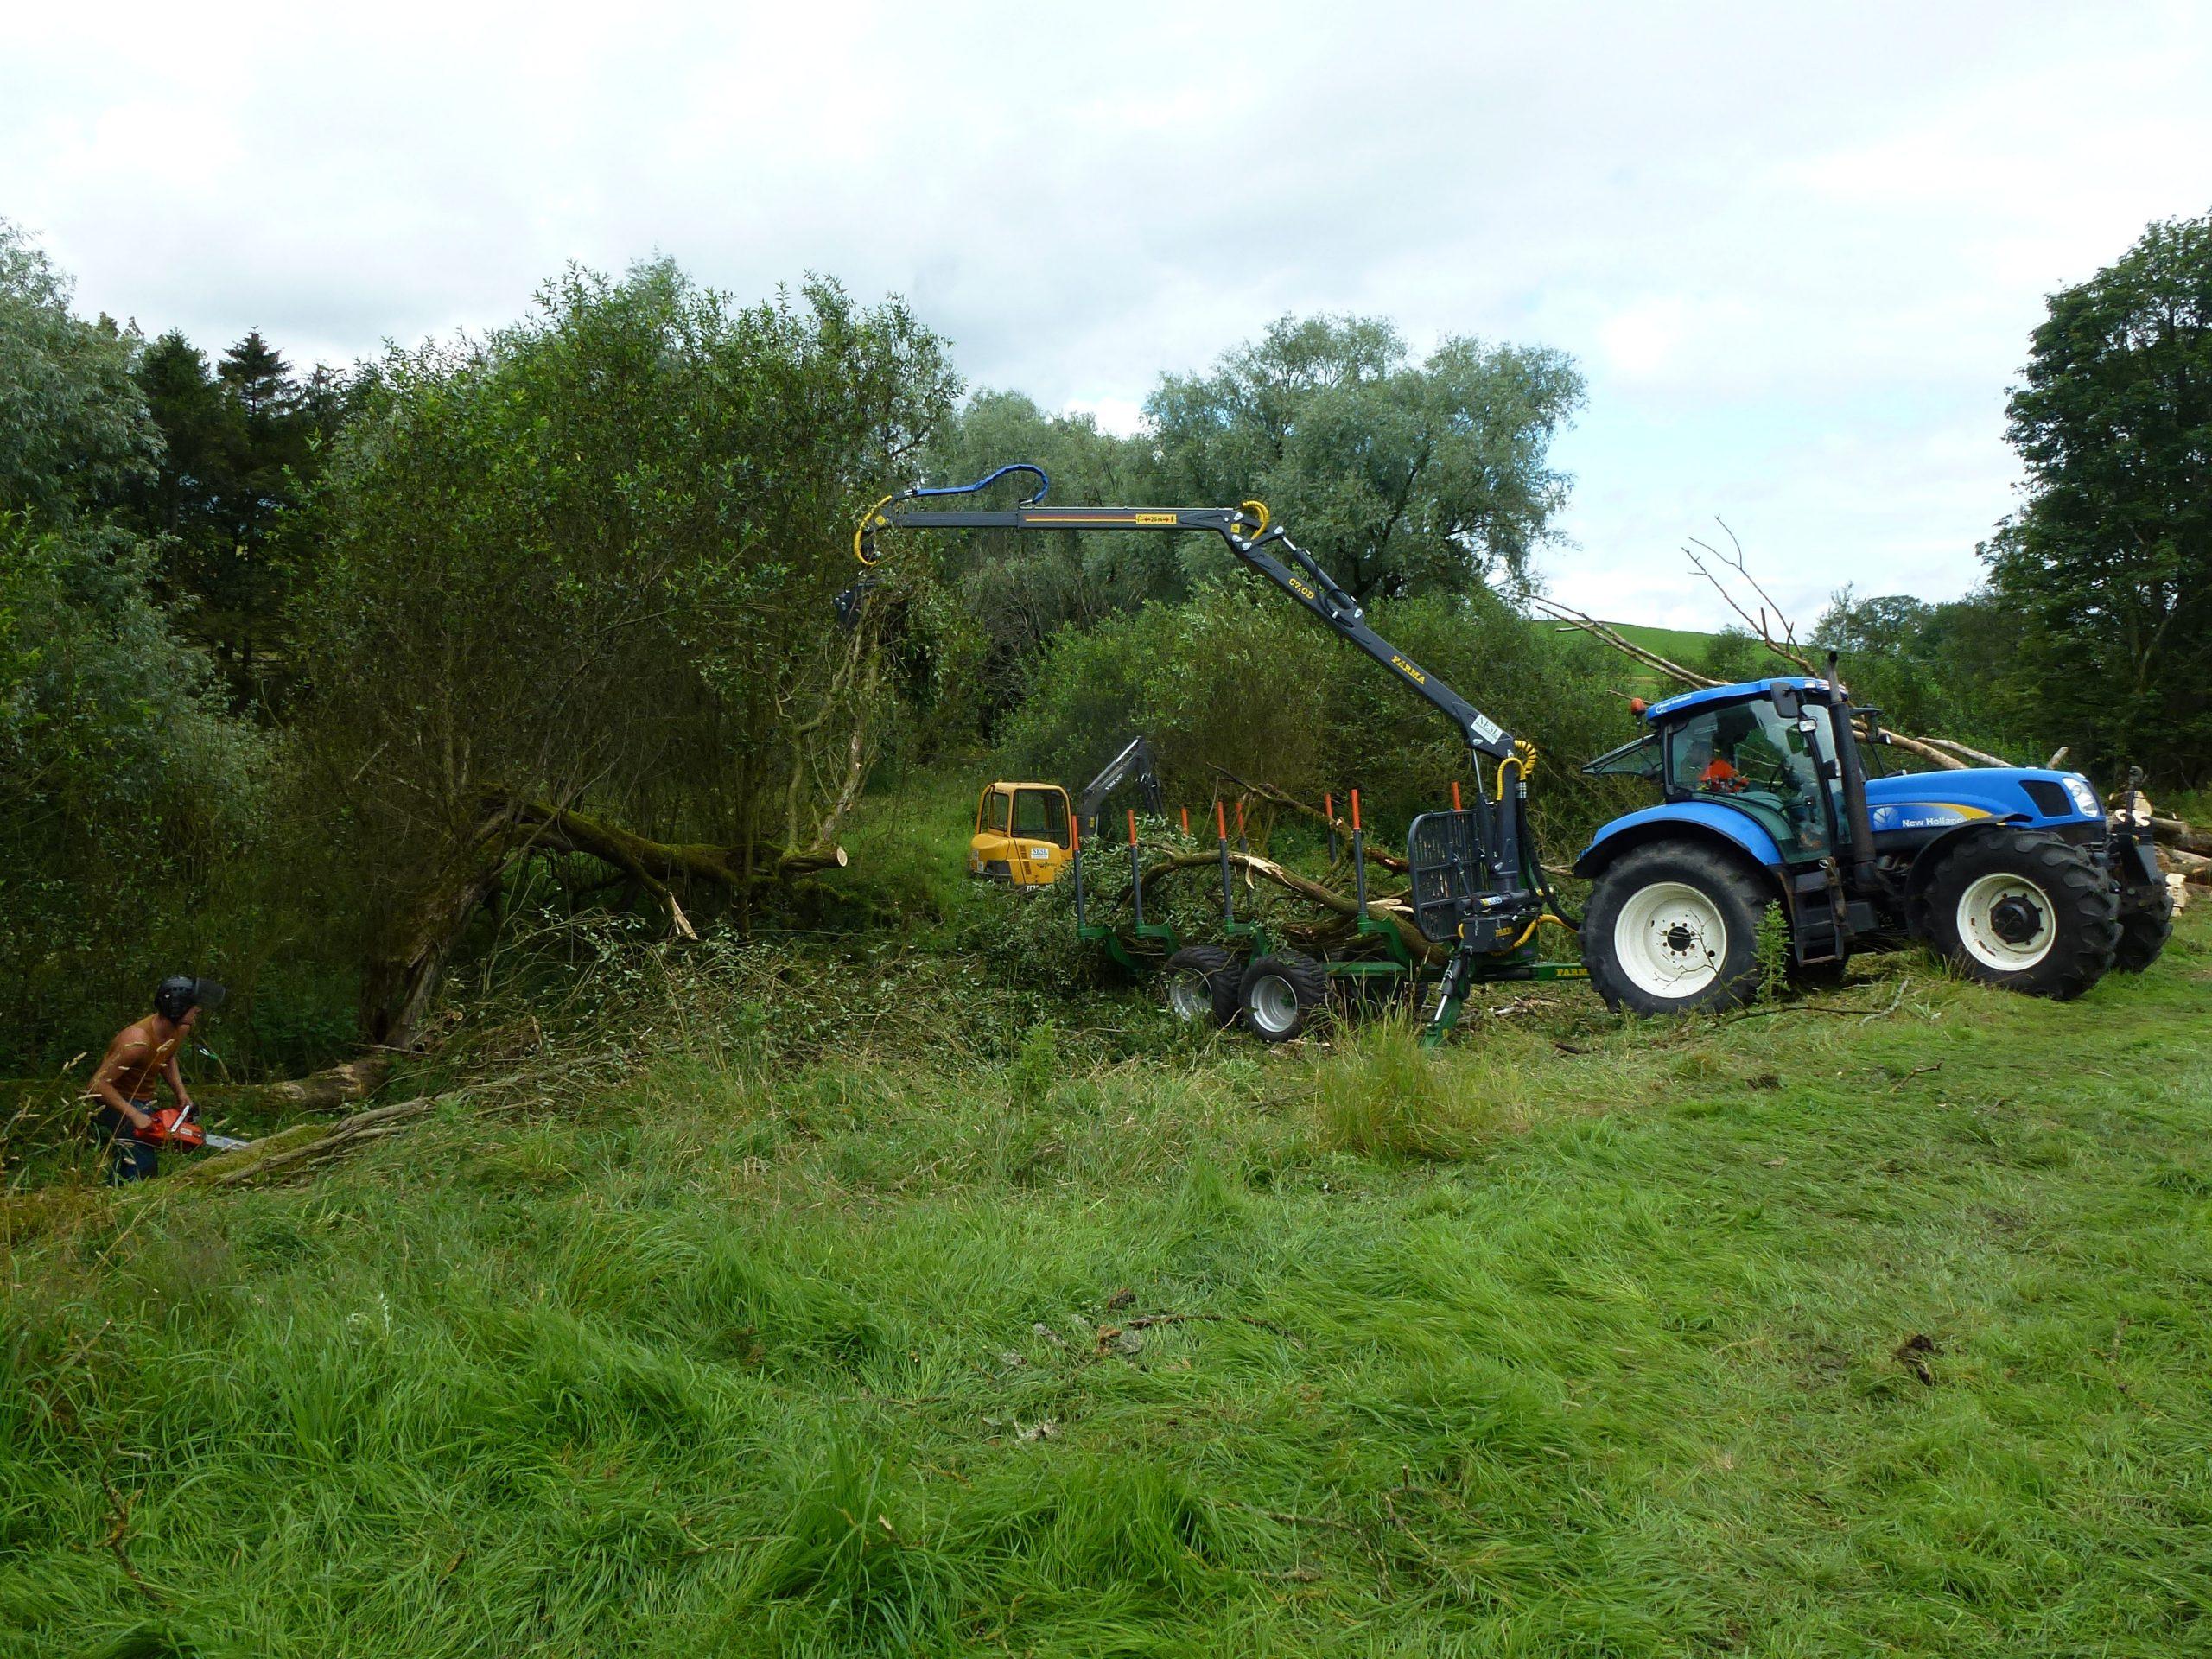 NESL Maintaining Grounds & Landscapes